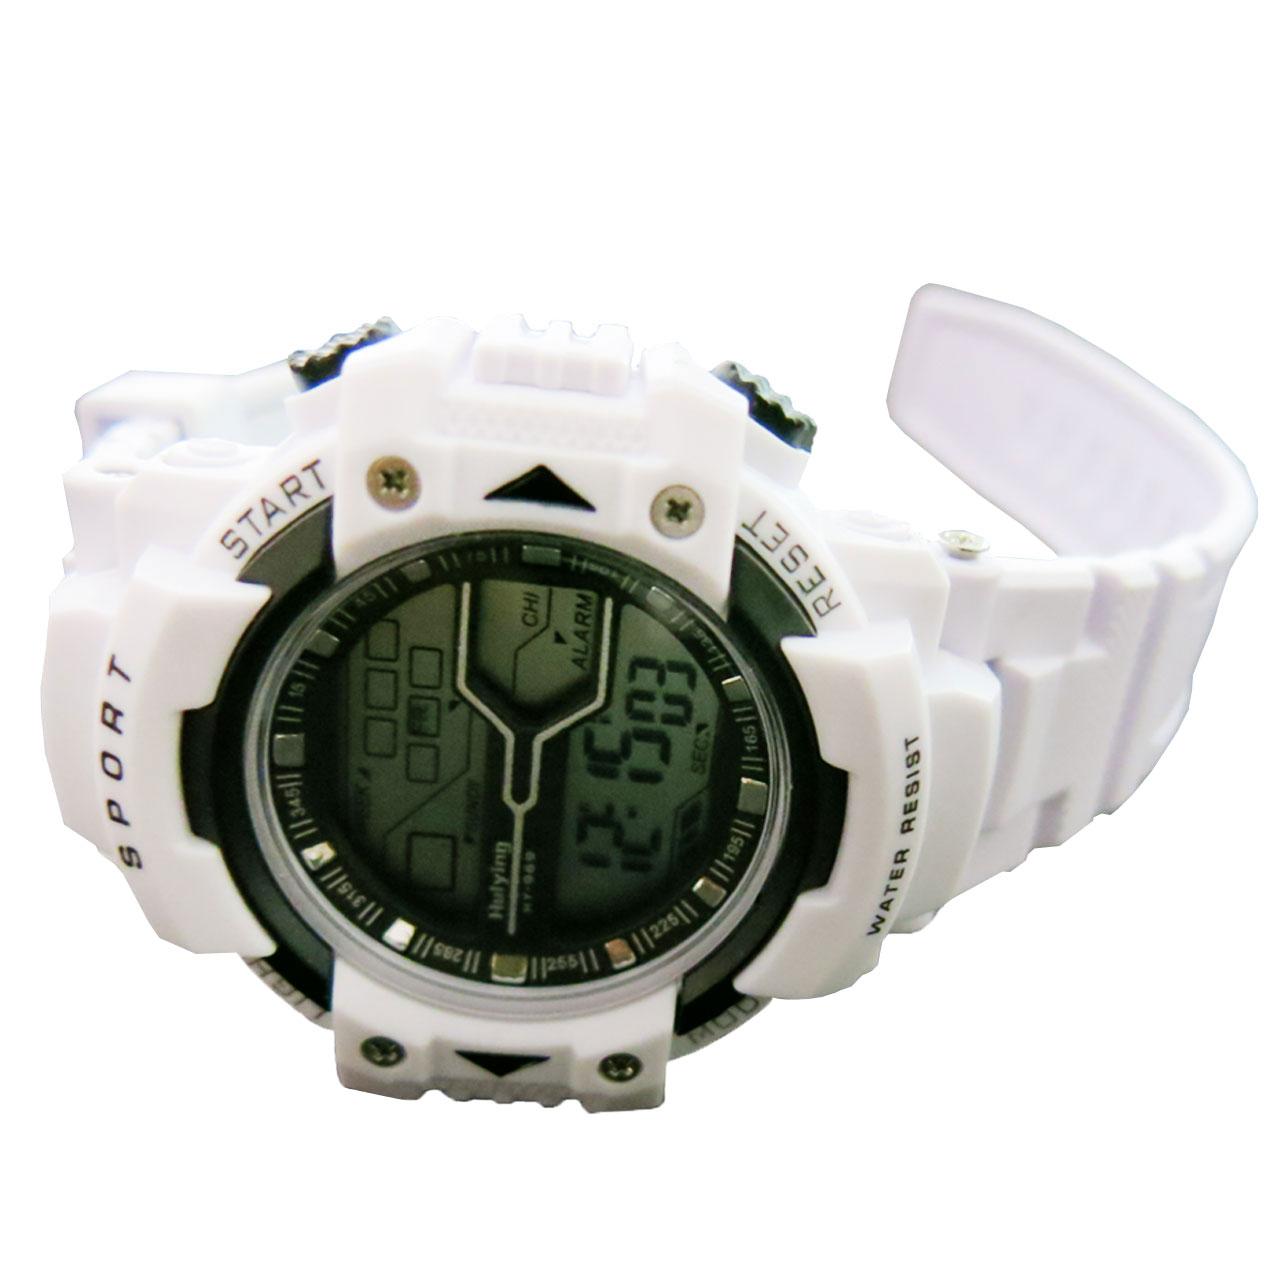 ساعت مچی دیجیتال اسپرت مدل W